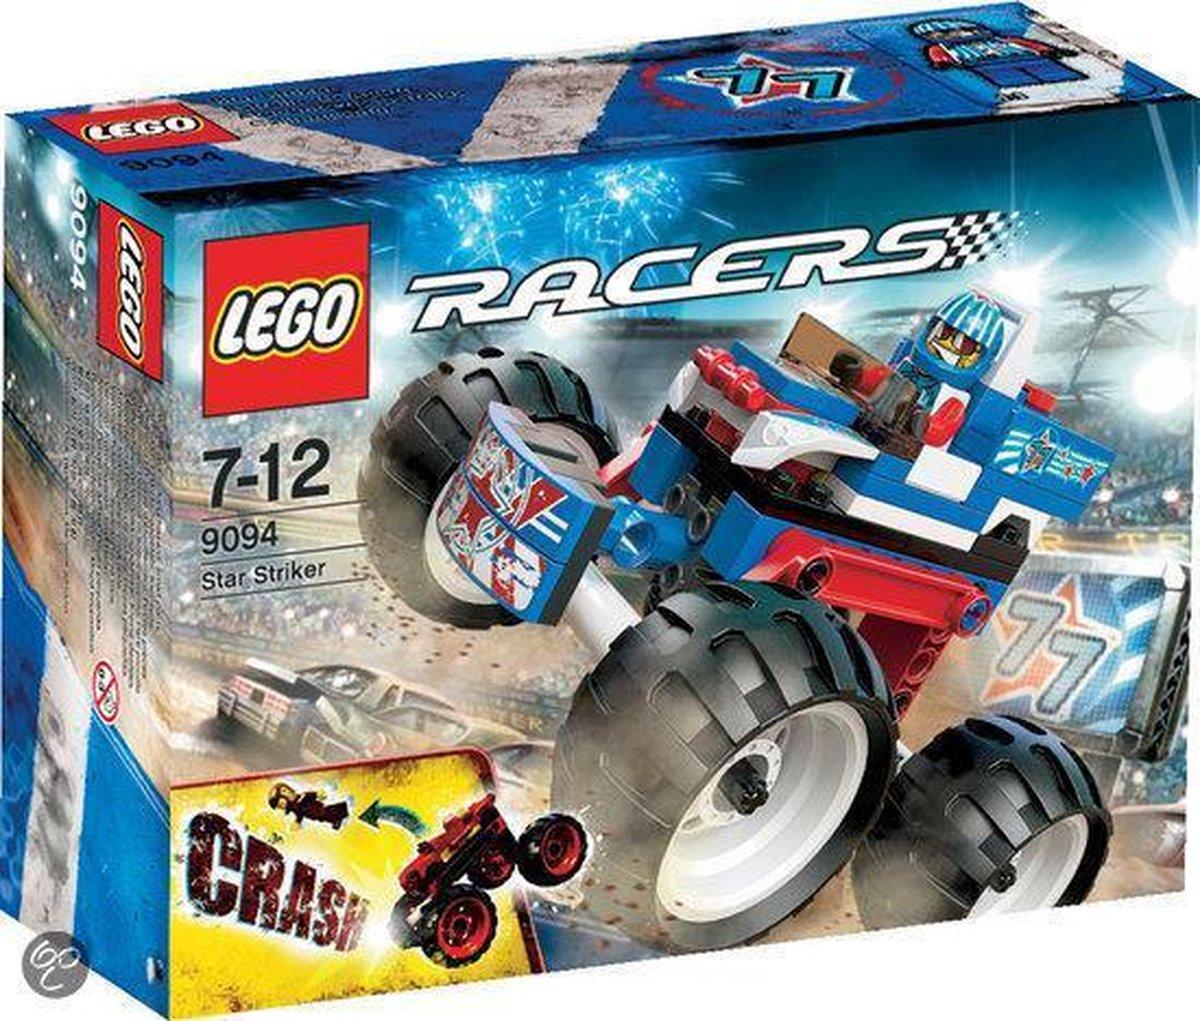 LEGO Racers Star Striker - 9094